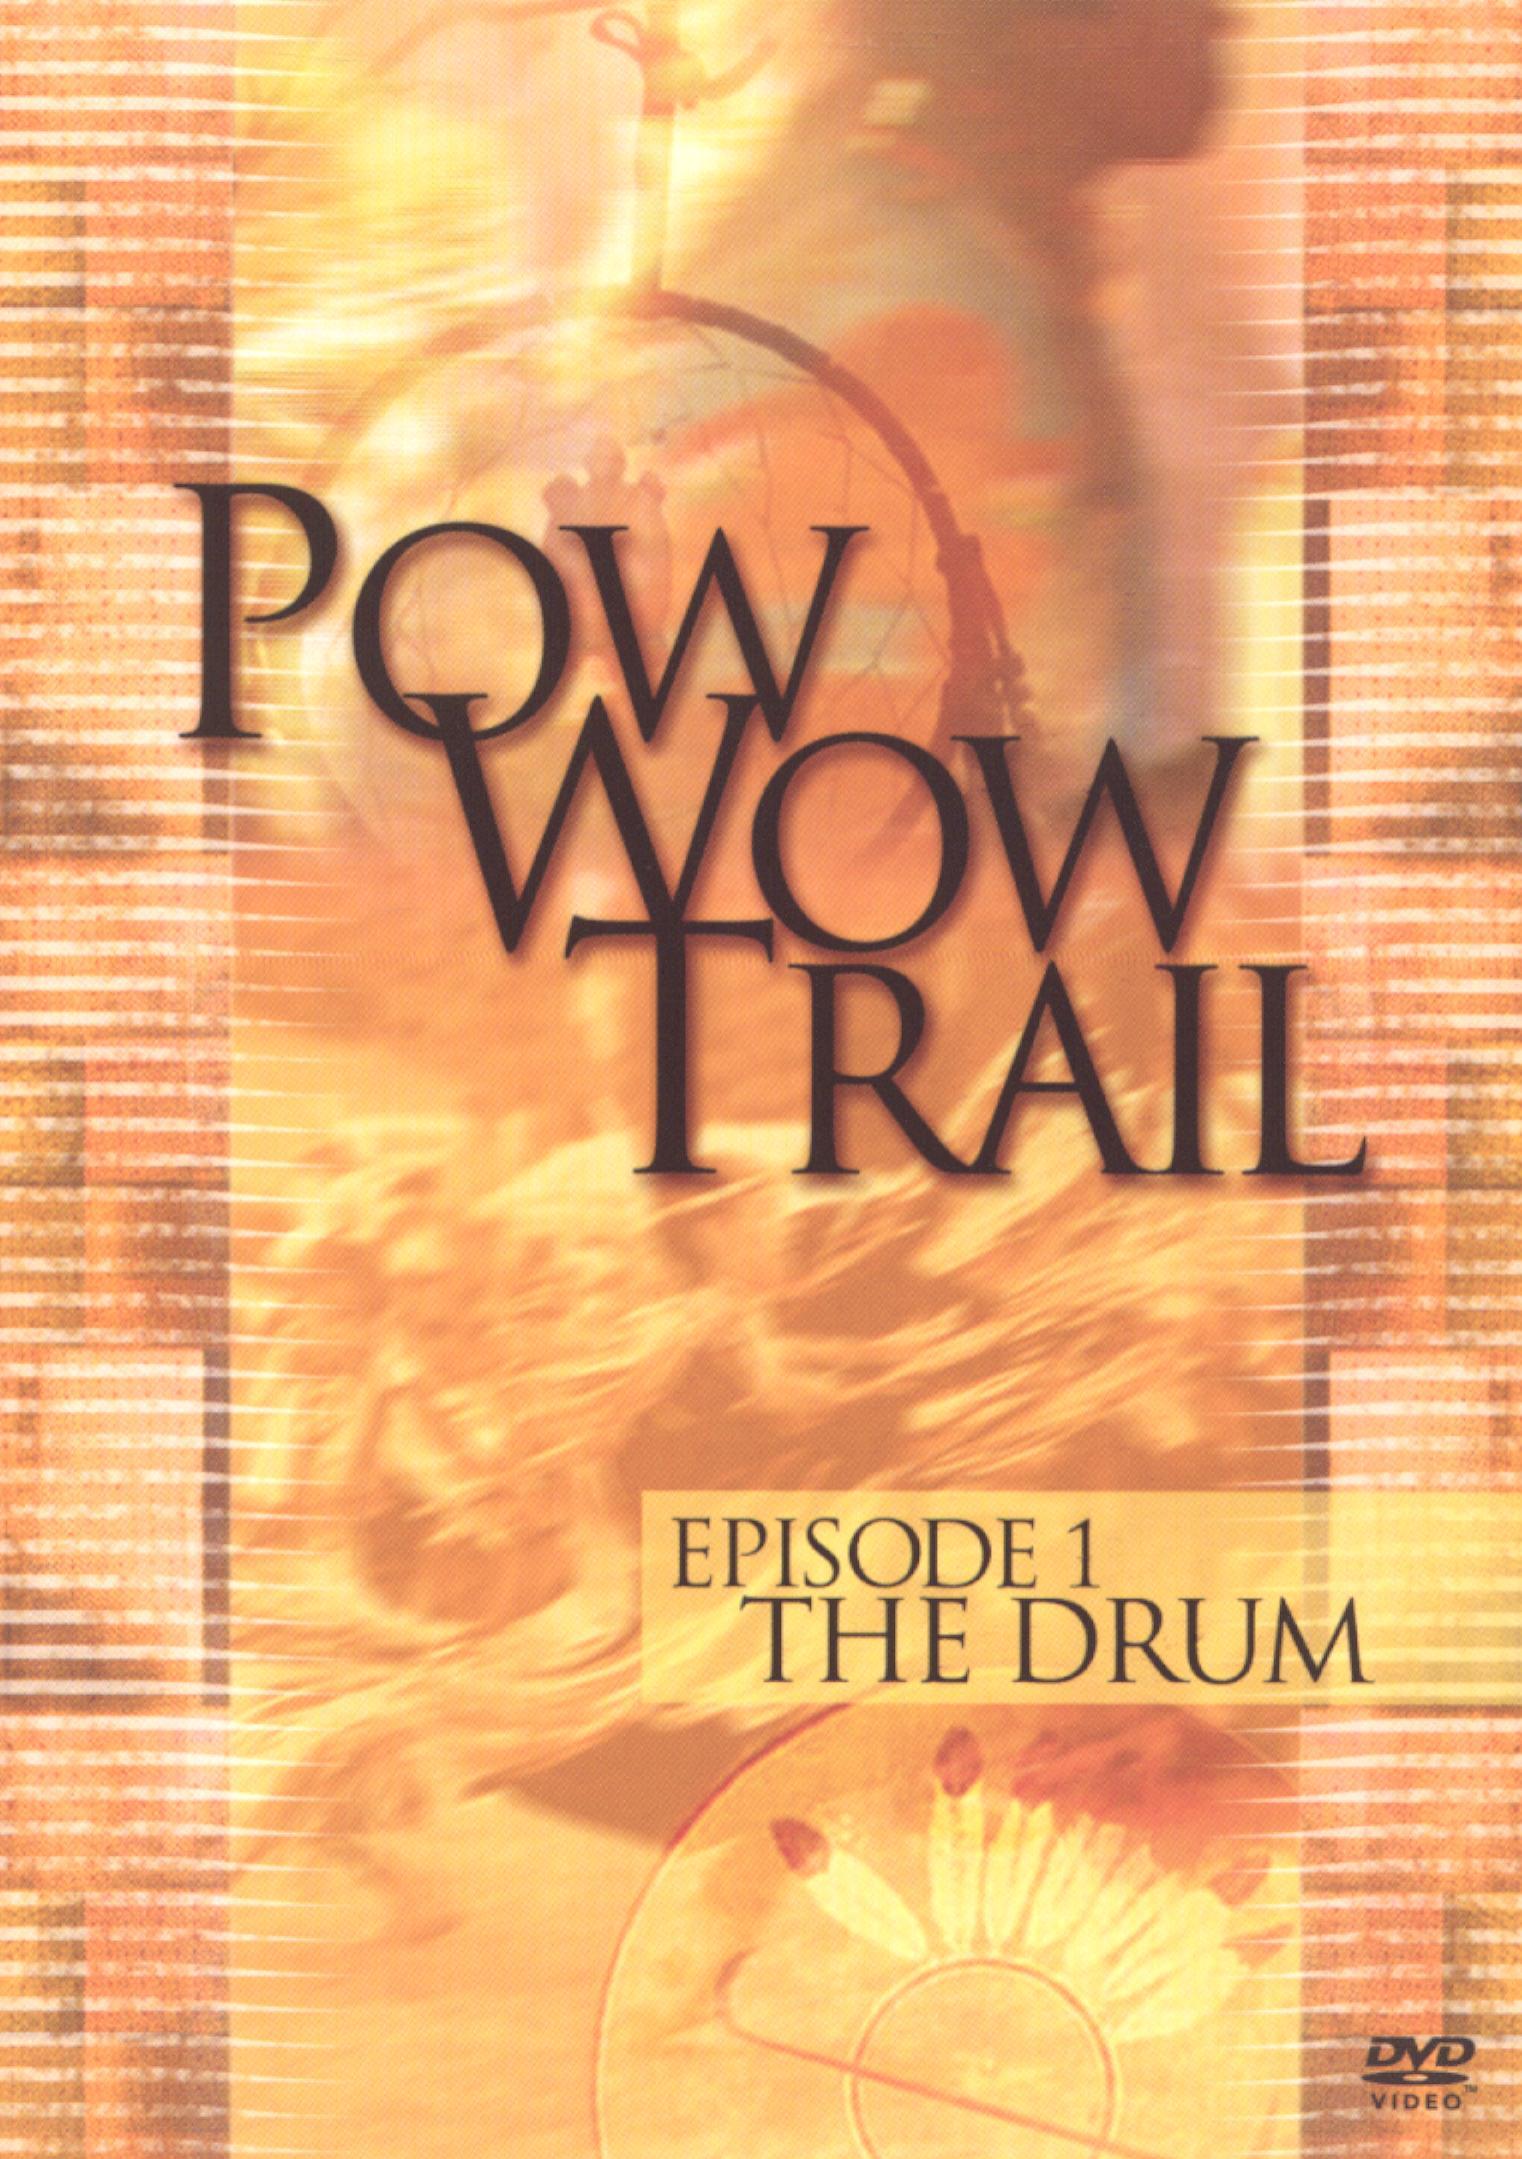 Pow Wow Trail, Episode 1: The Drum